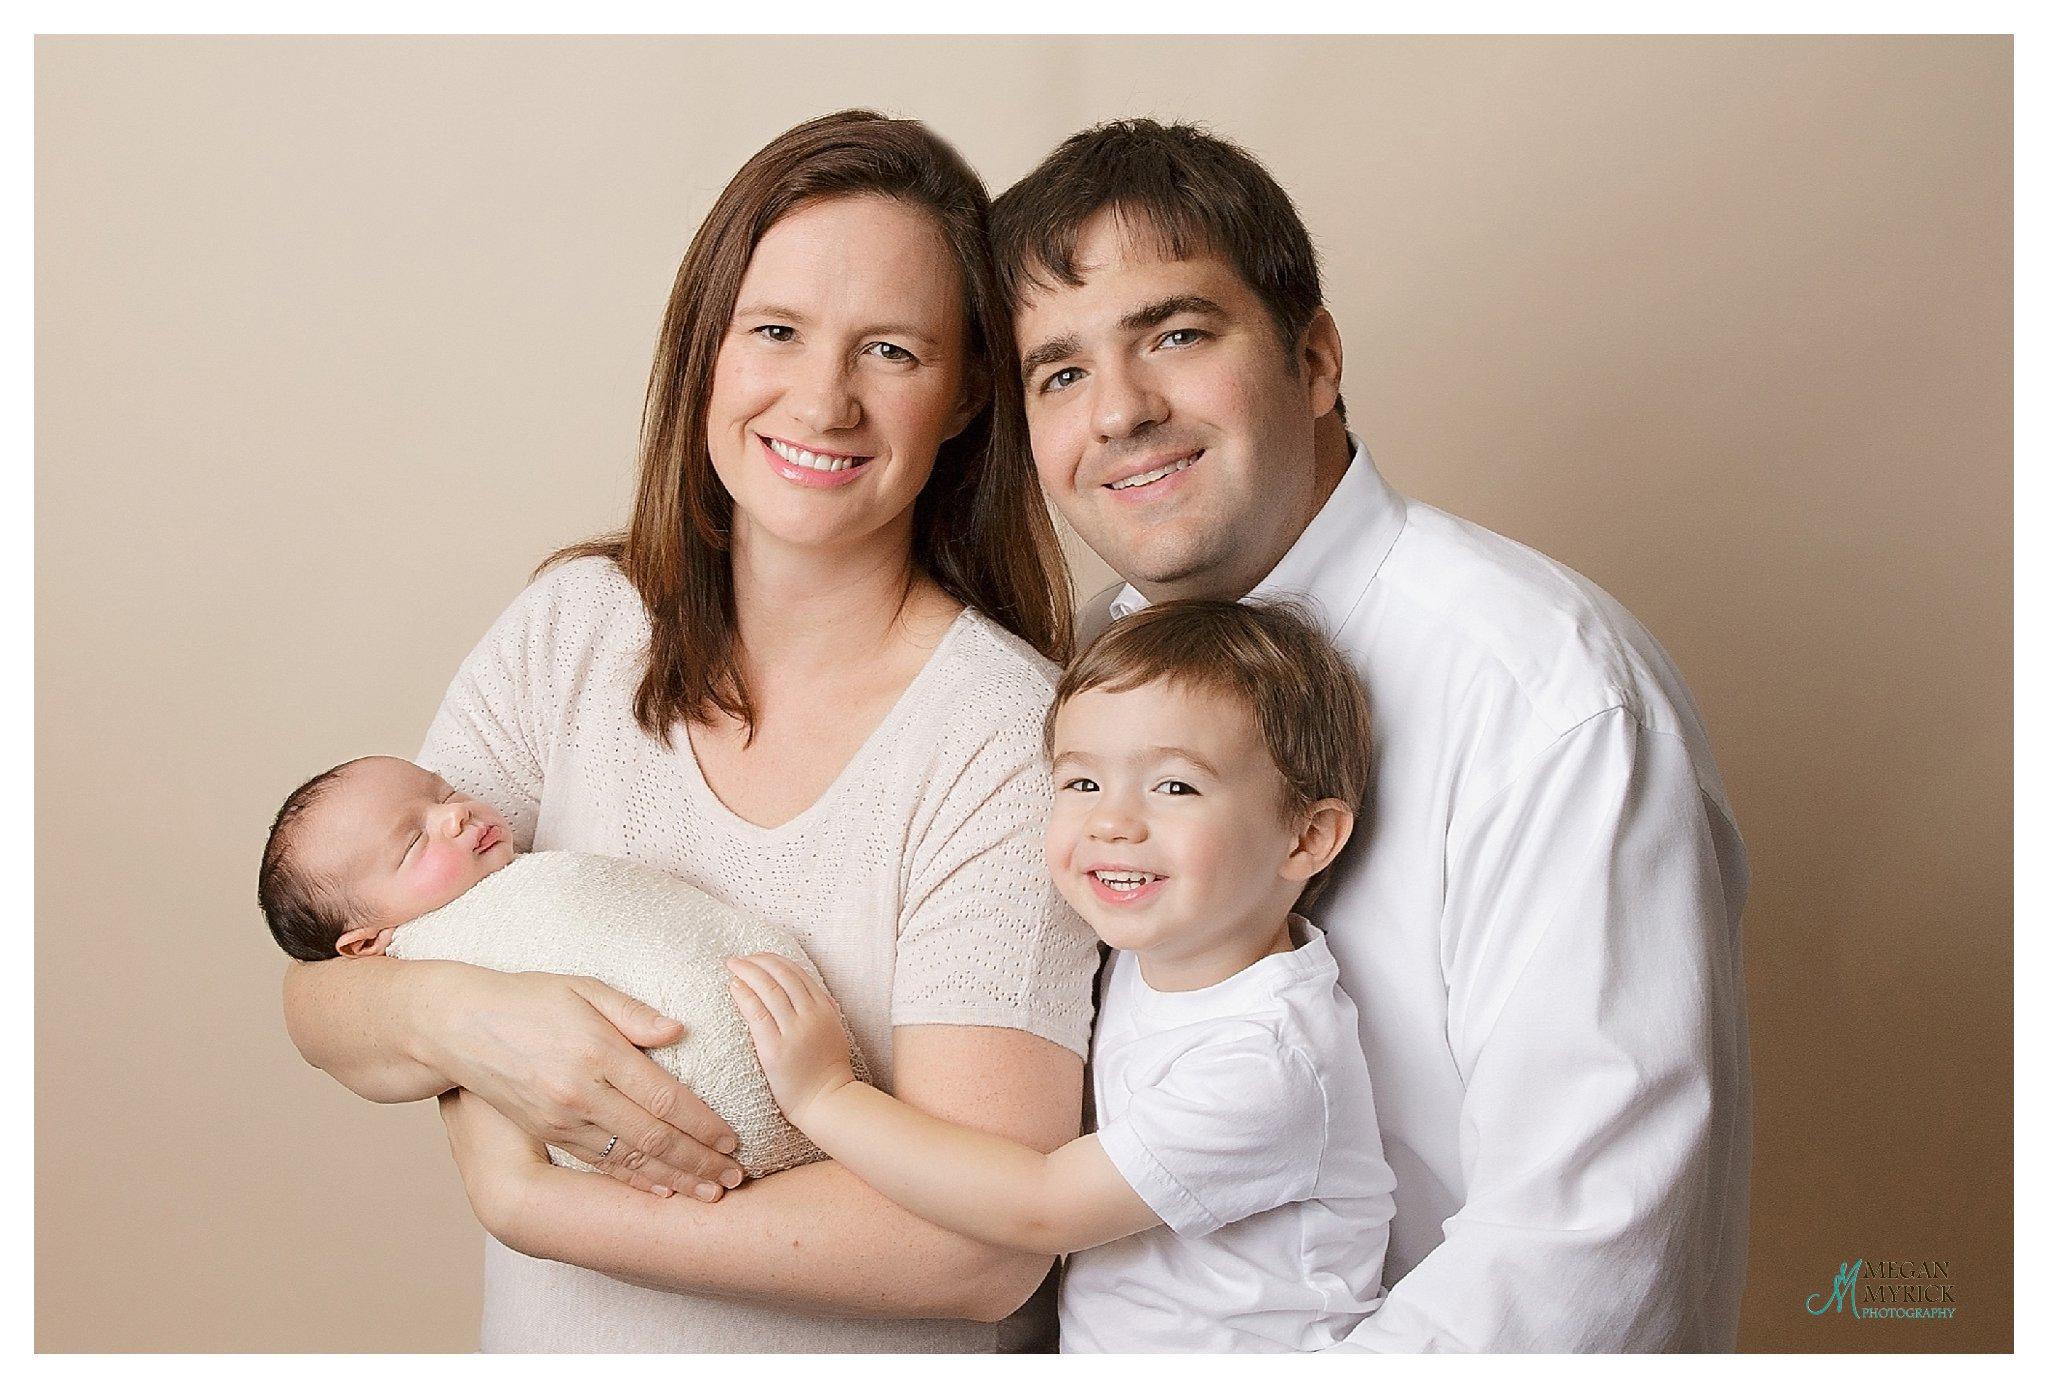 Megan Myrick Photography | www.meganmyrickphotography.com | Richmond Hill Newborn Photographer